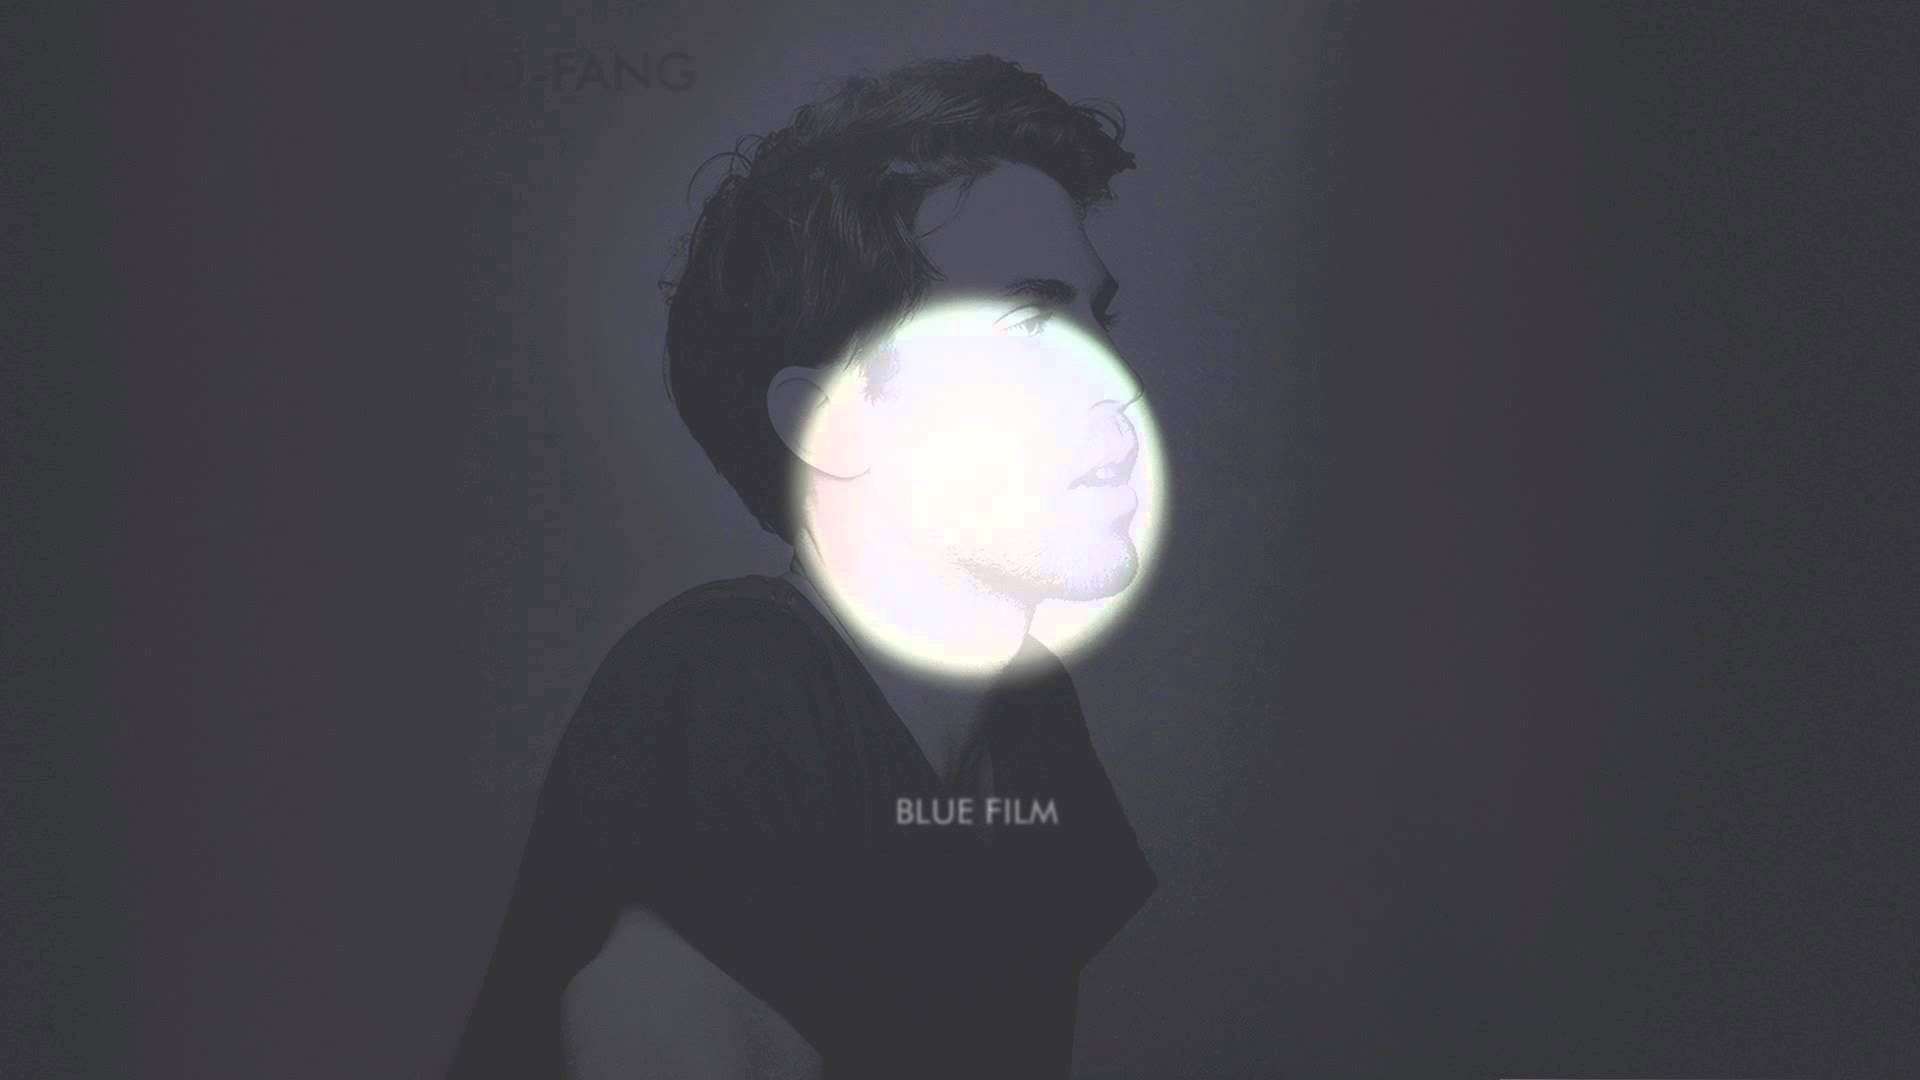 lo fang blue film album download free